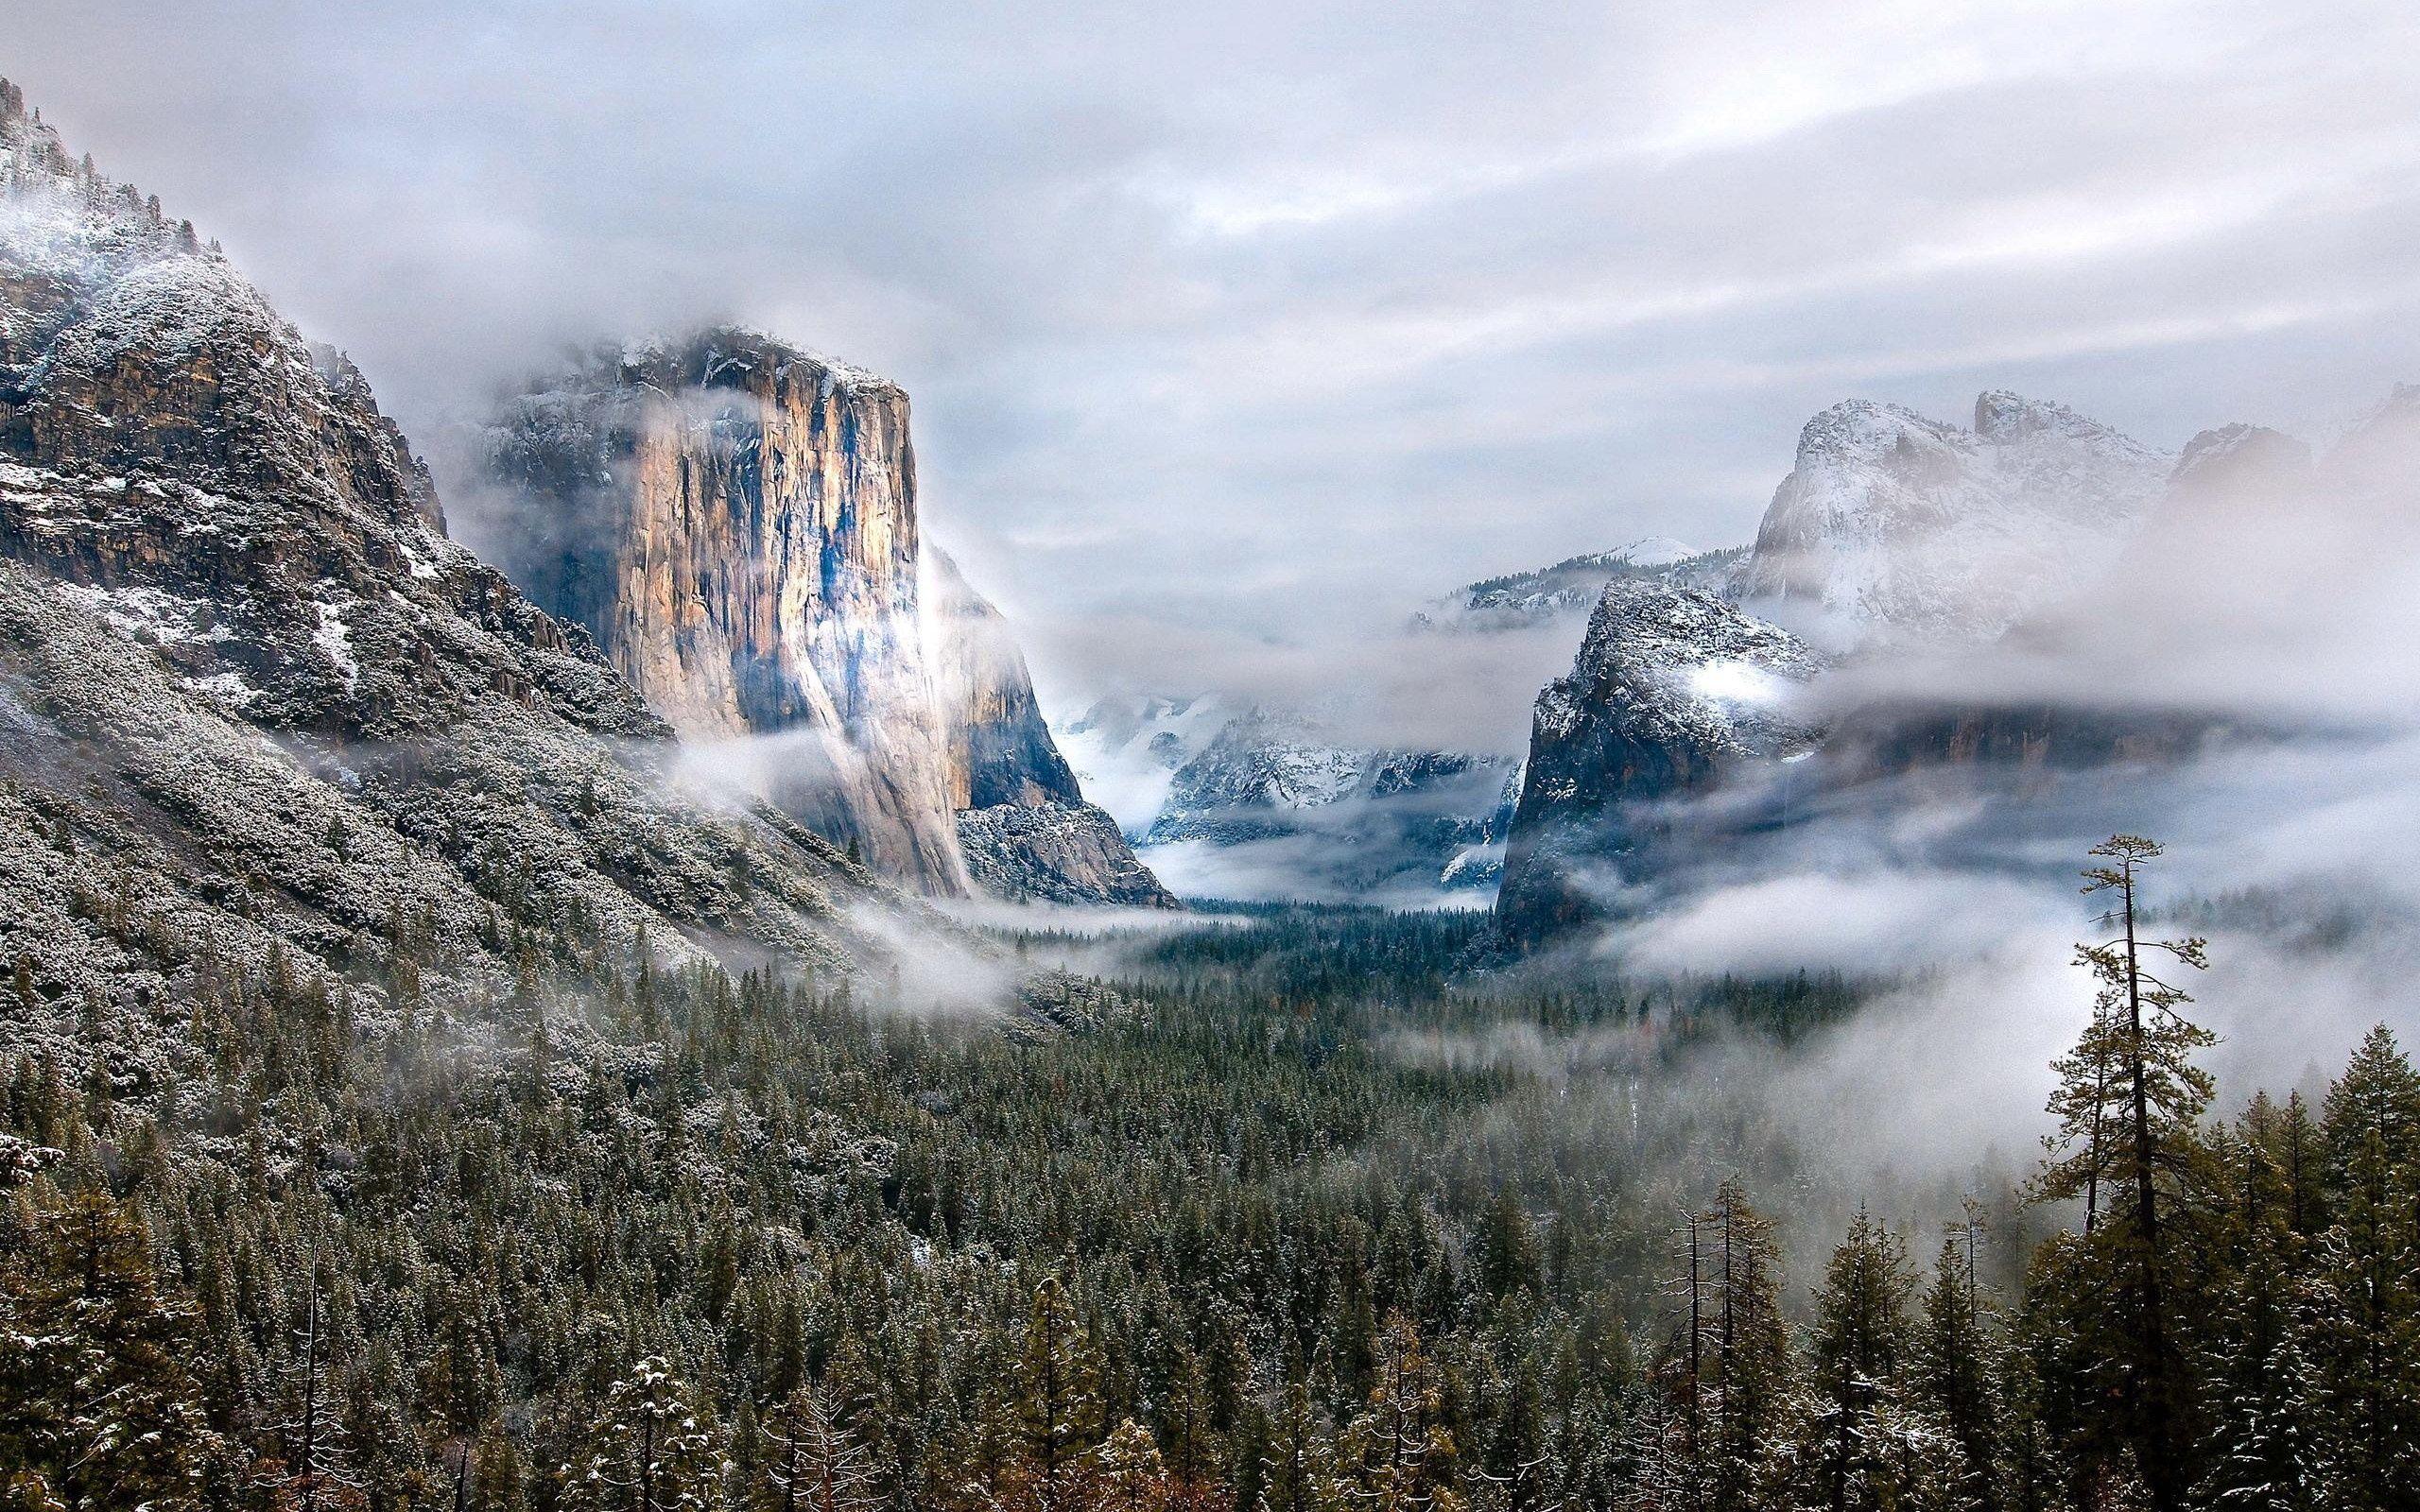 Snow Mountains Landscape Clouds Forest Mist Fog Winter Wallpaper